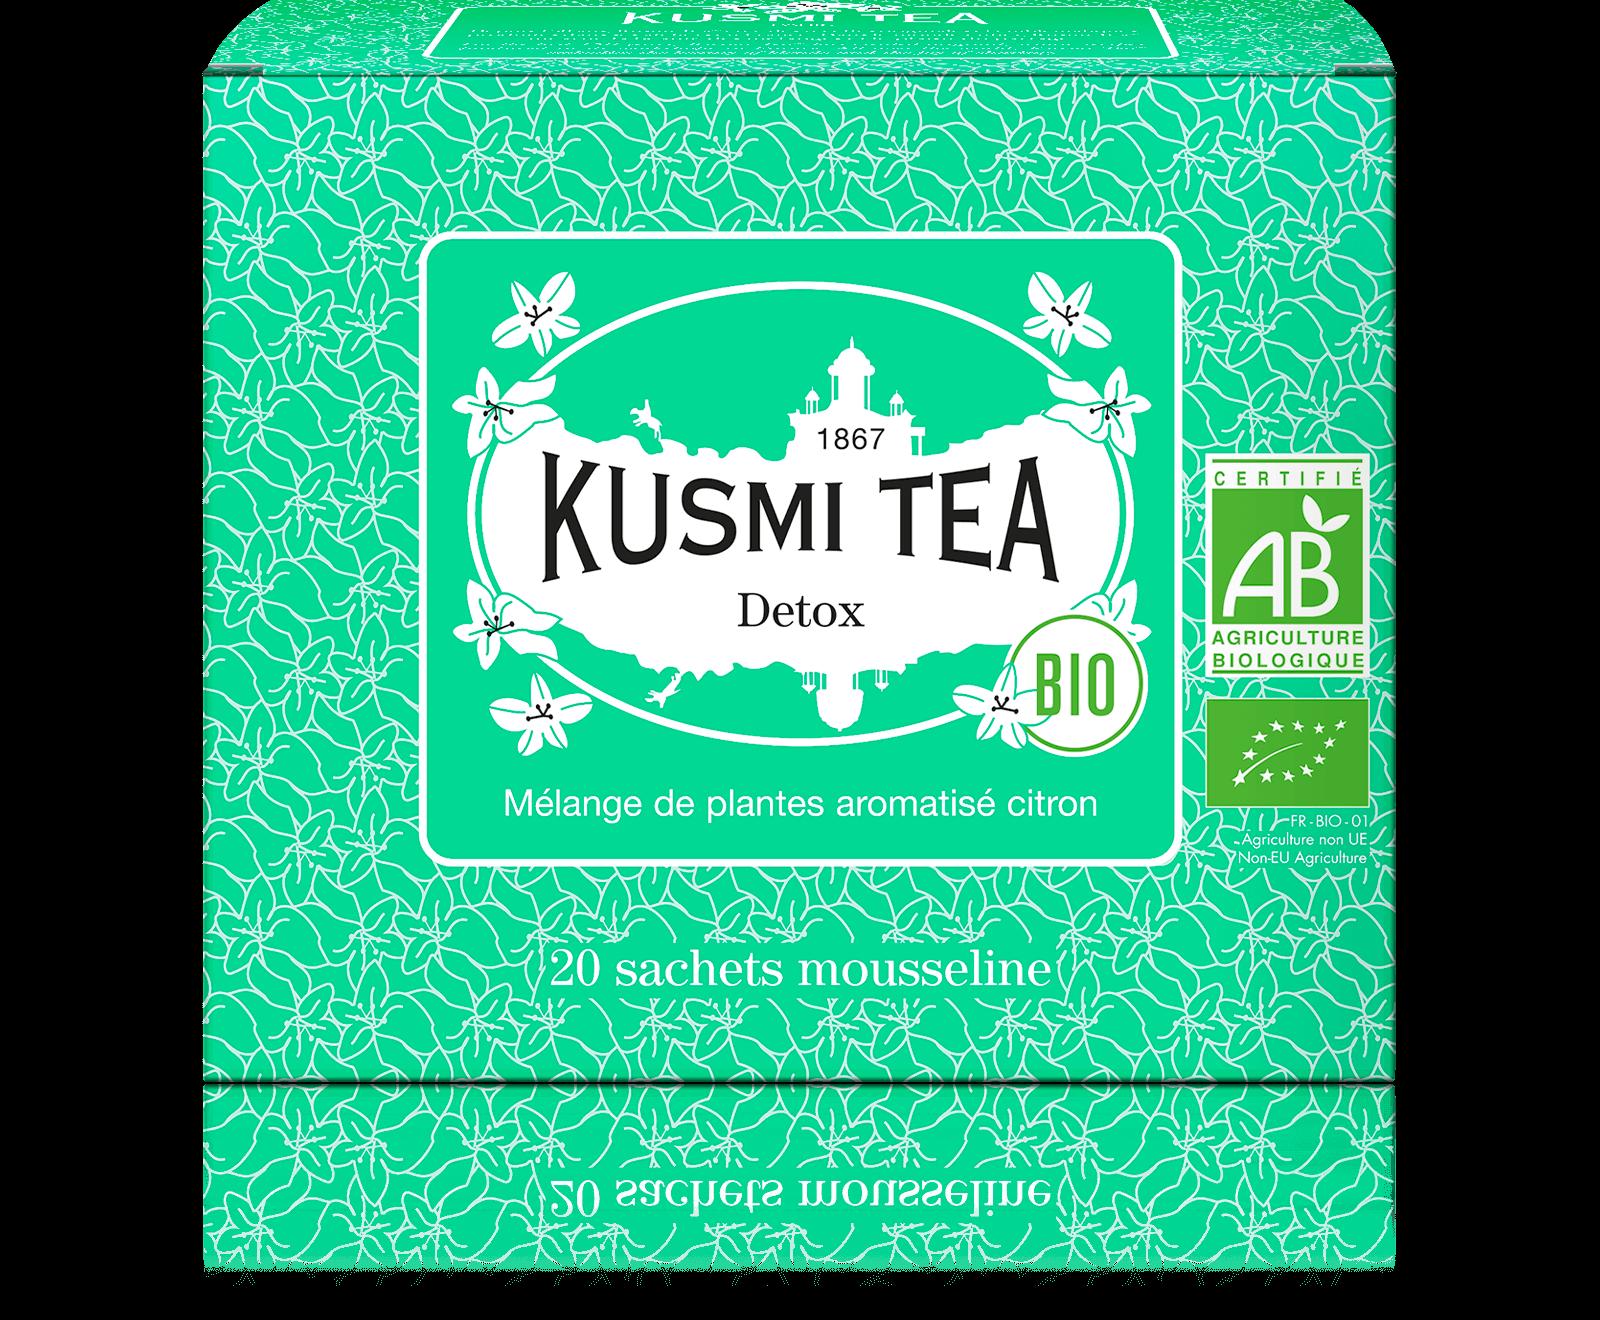 Detox bio - Thé vert, maté, citron - Sachets de thé - Kusmi Tea